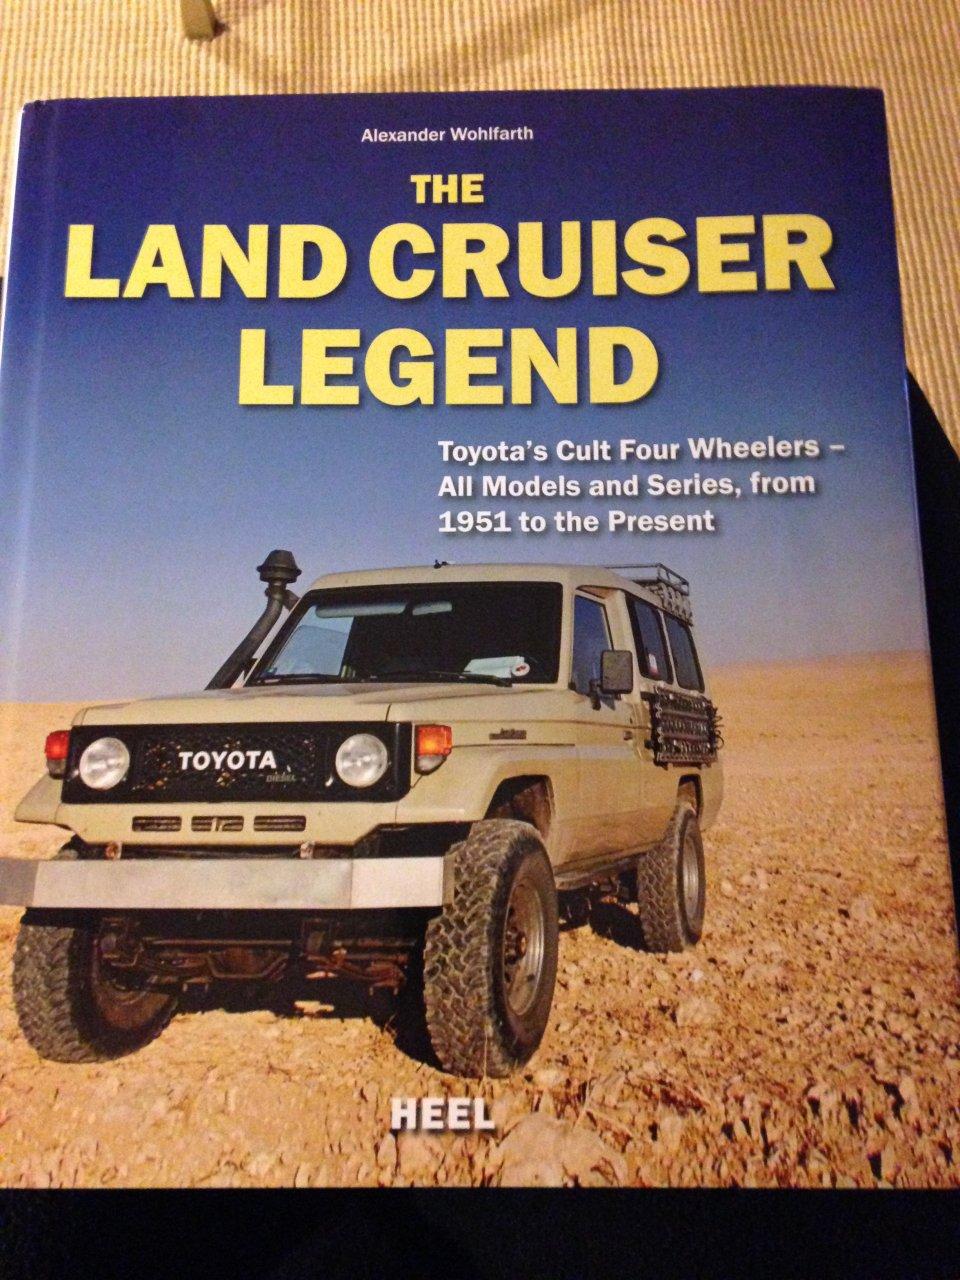 LAND CRUISER LEGEND TOYOTA BOOK WOHLFARTH FJ40 FJ